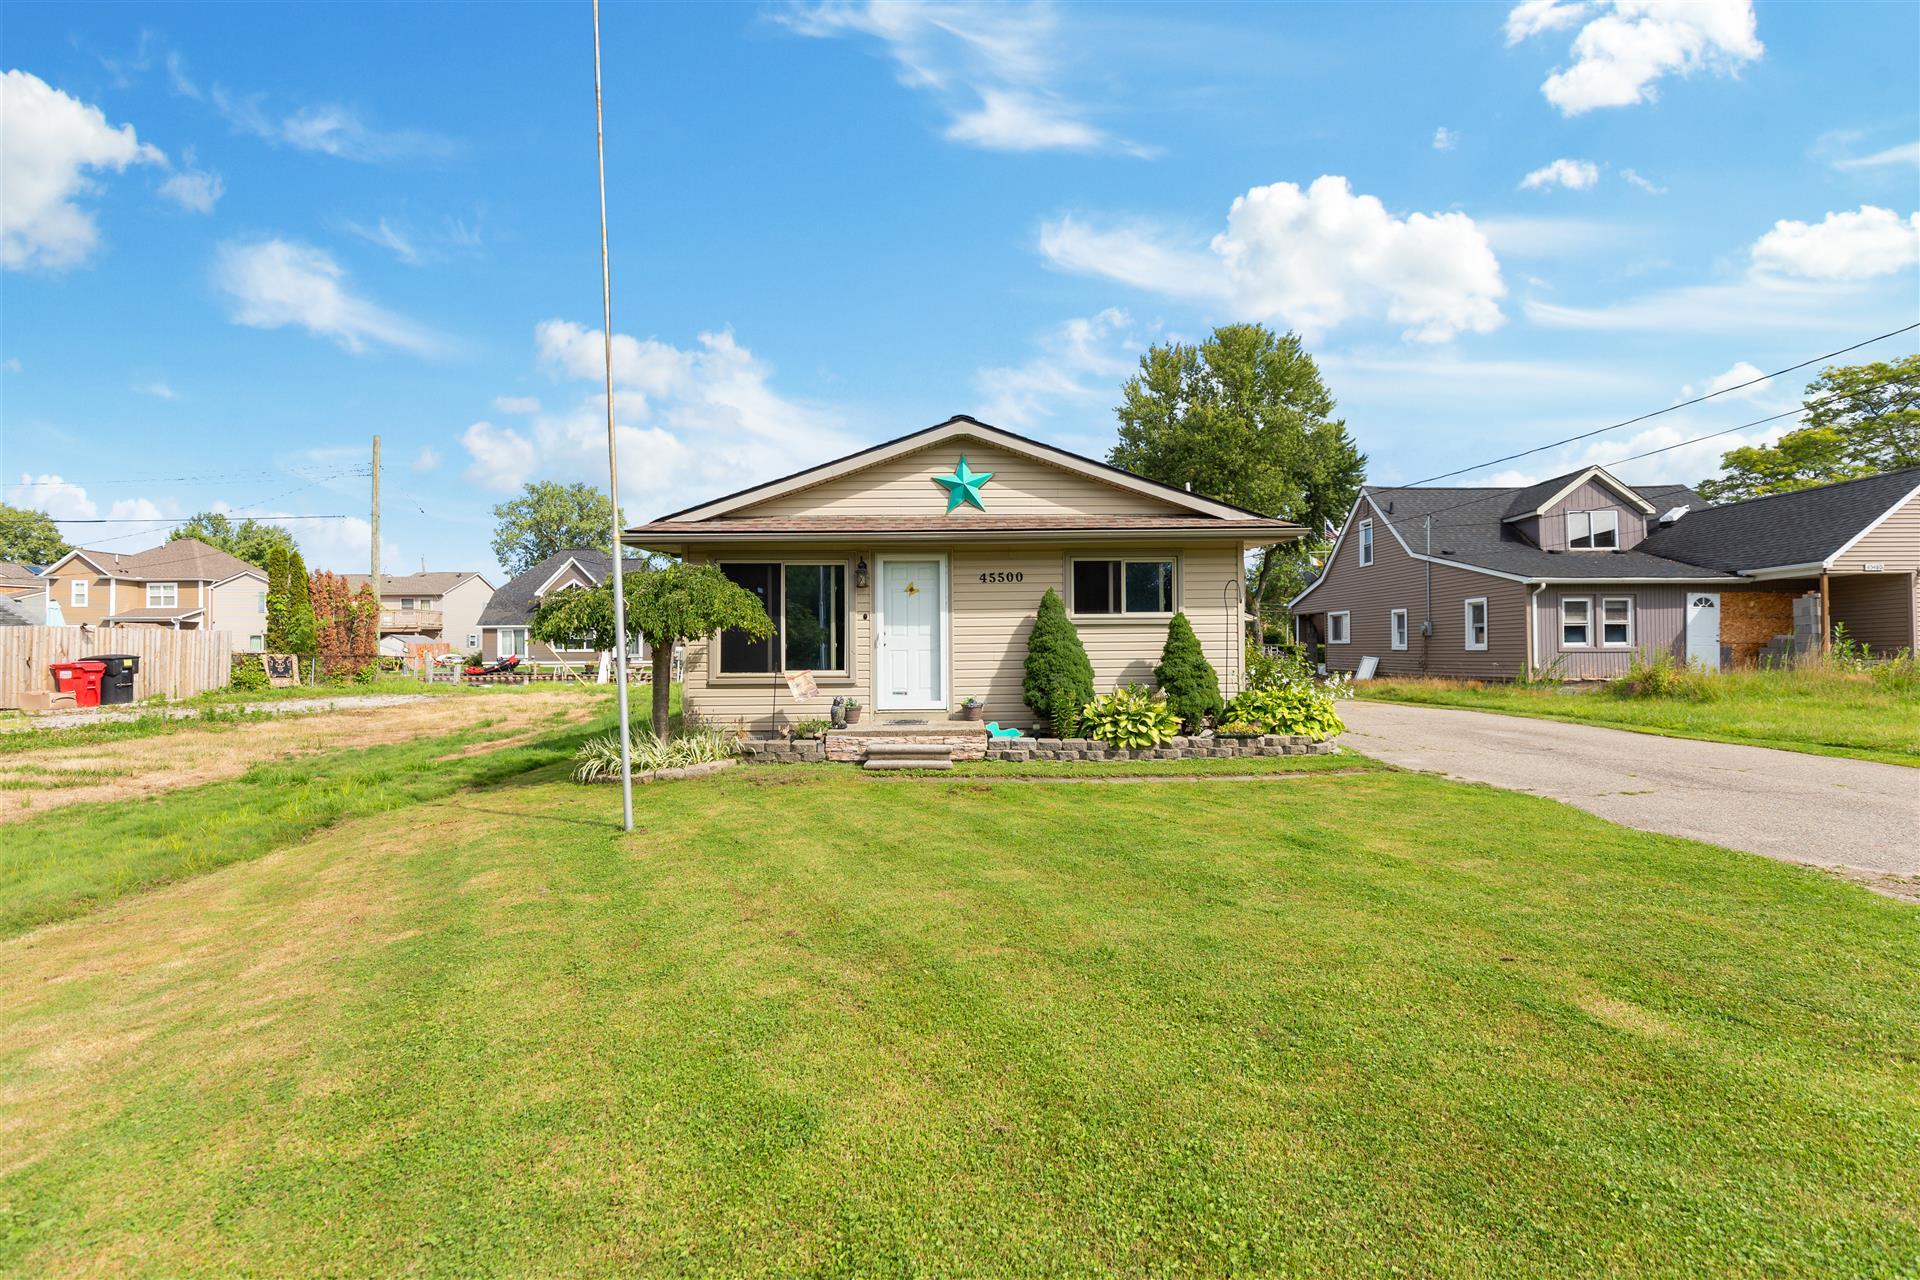 Sale Pending! – 25179 Rosenbusch Blvd. Warren, 48089